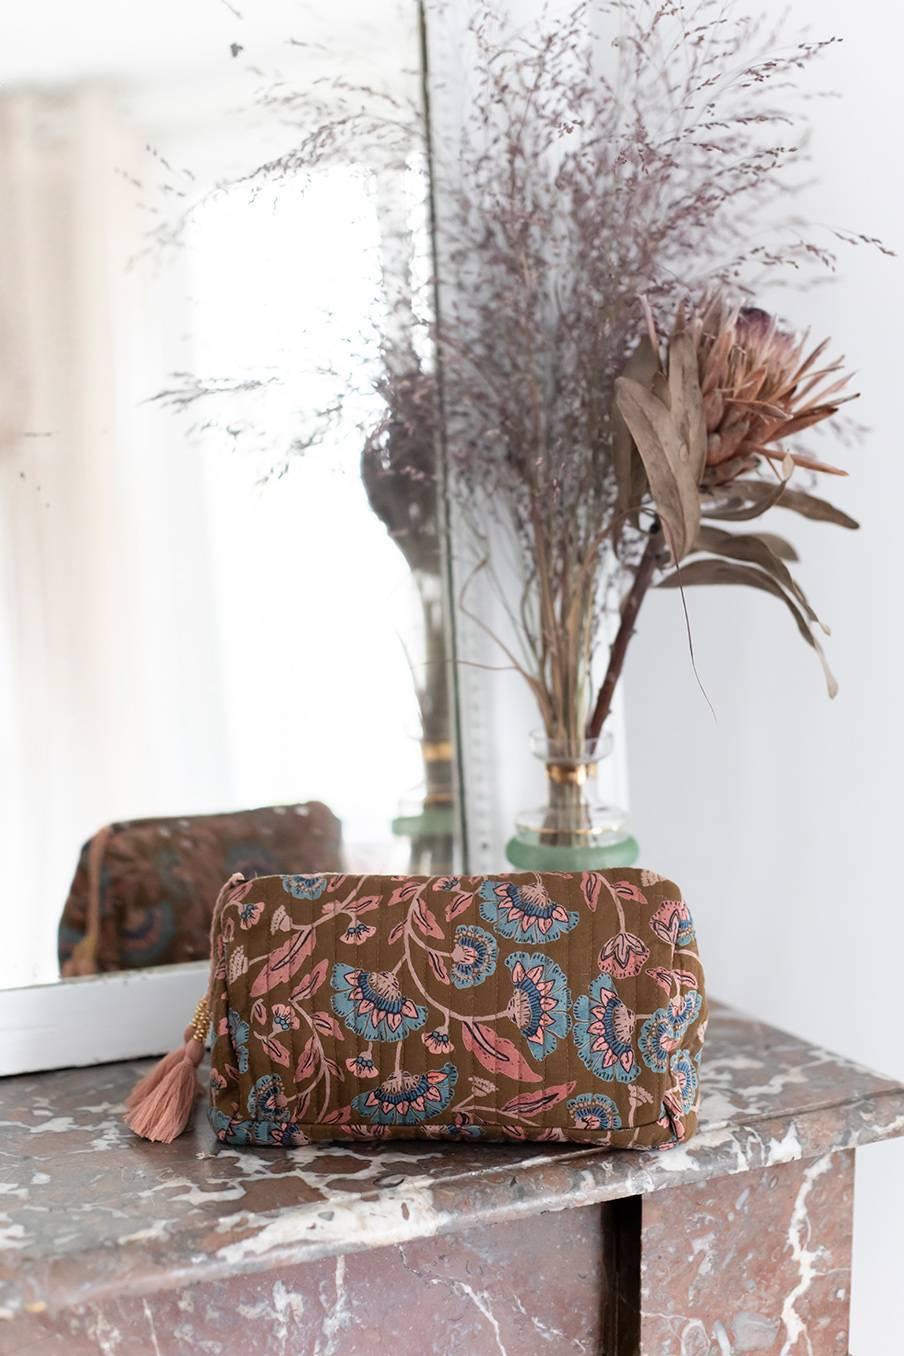 boheme chic vintage pochette de voyage femme amila bronze folk flowers